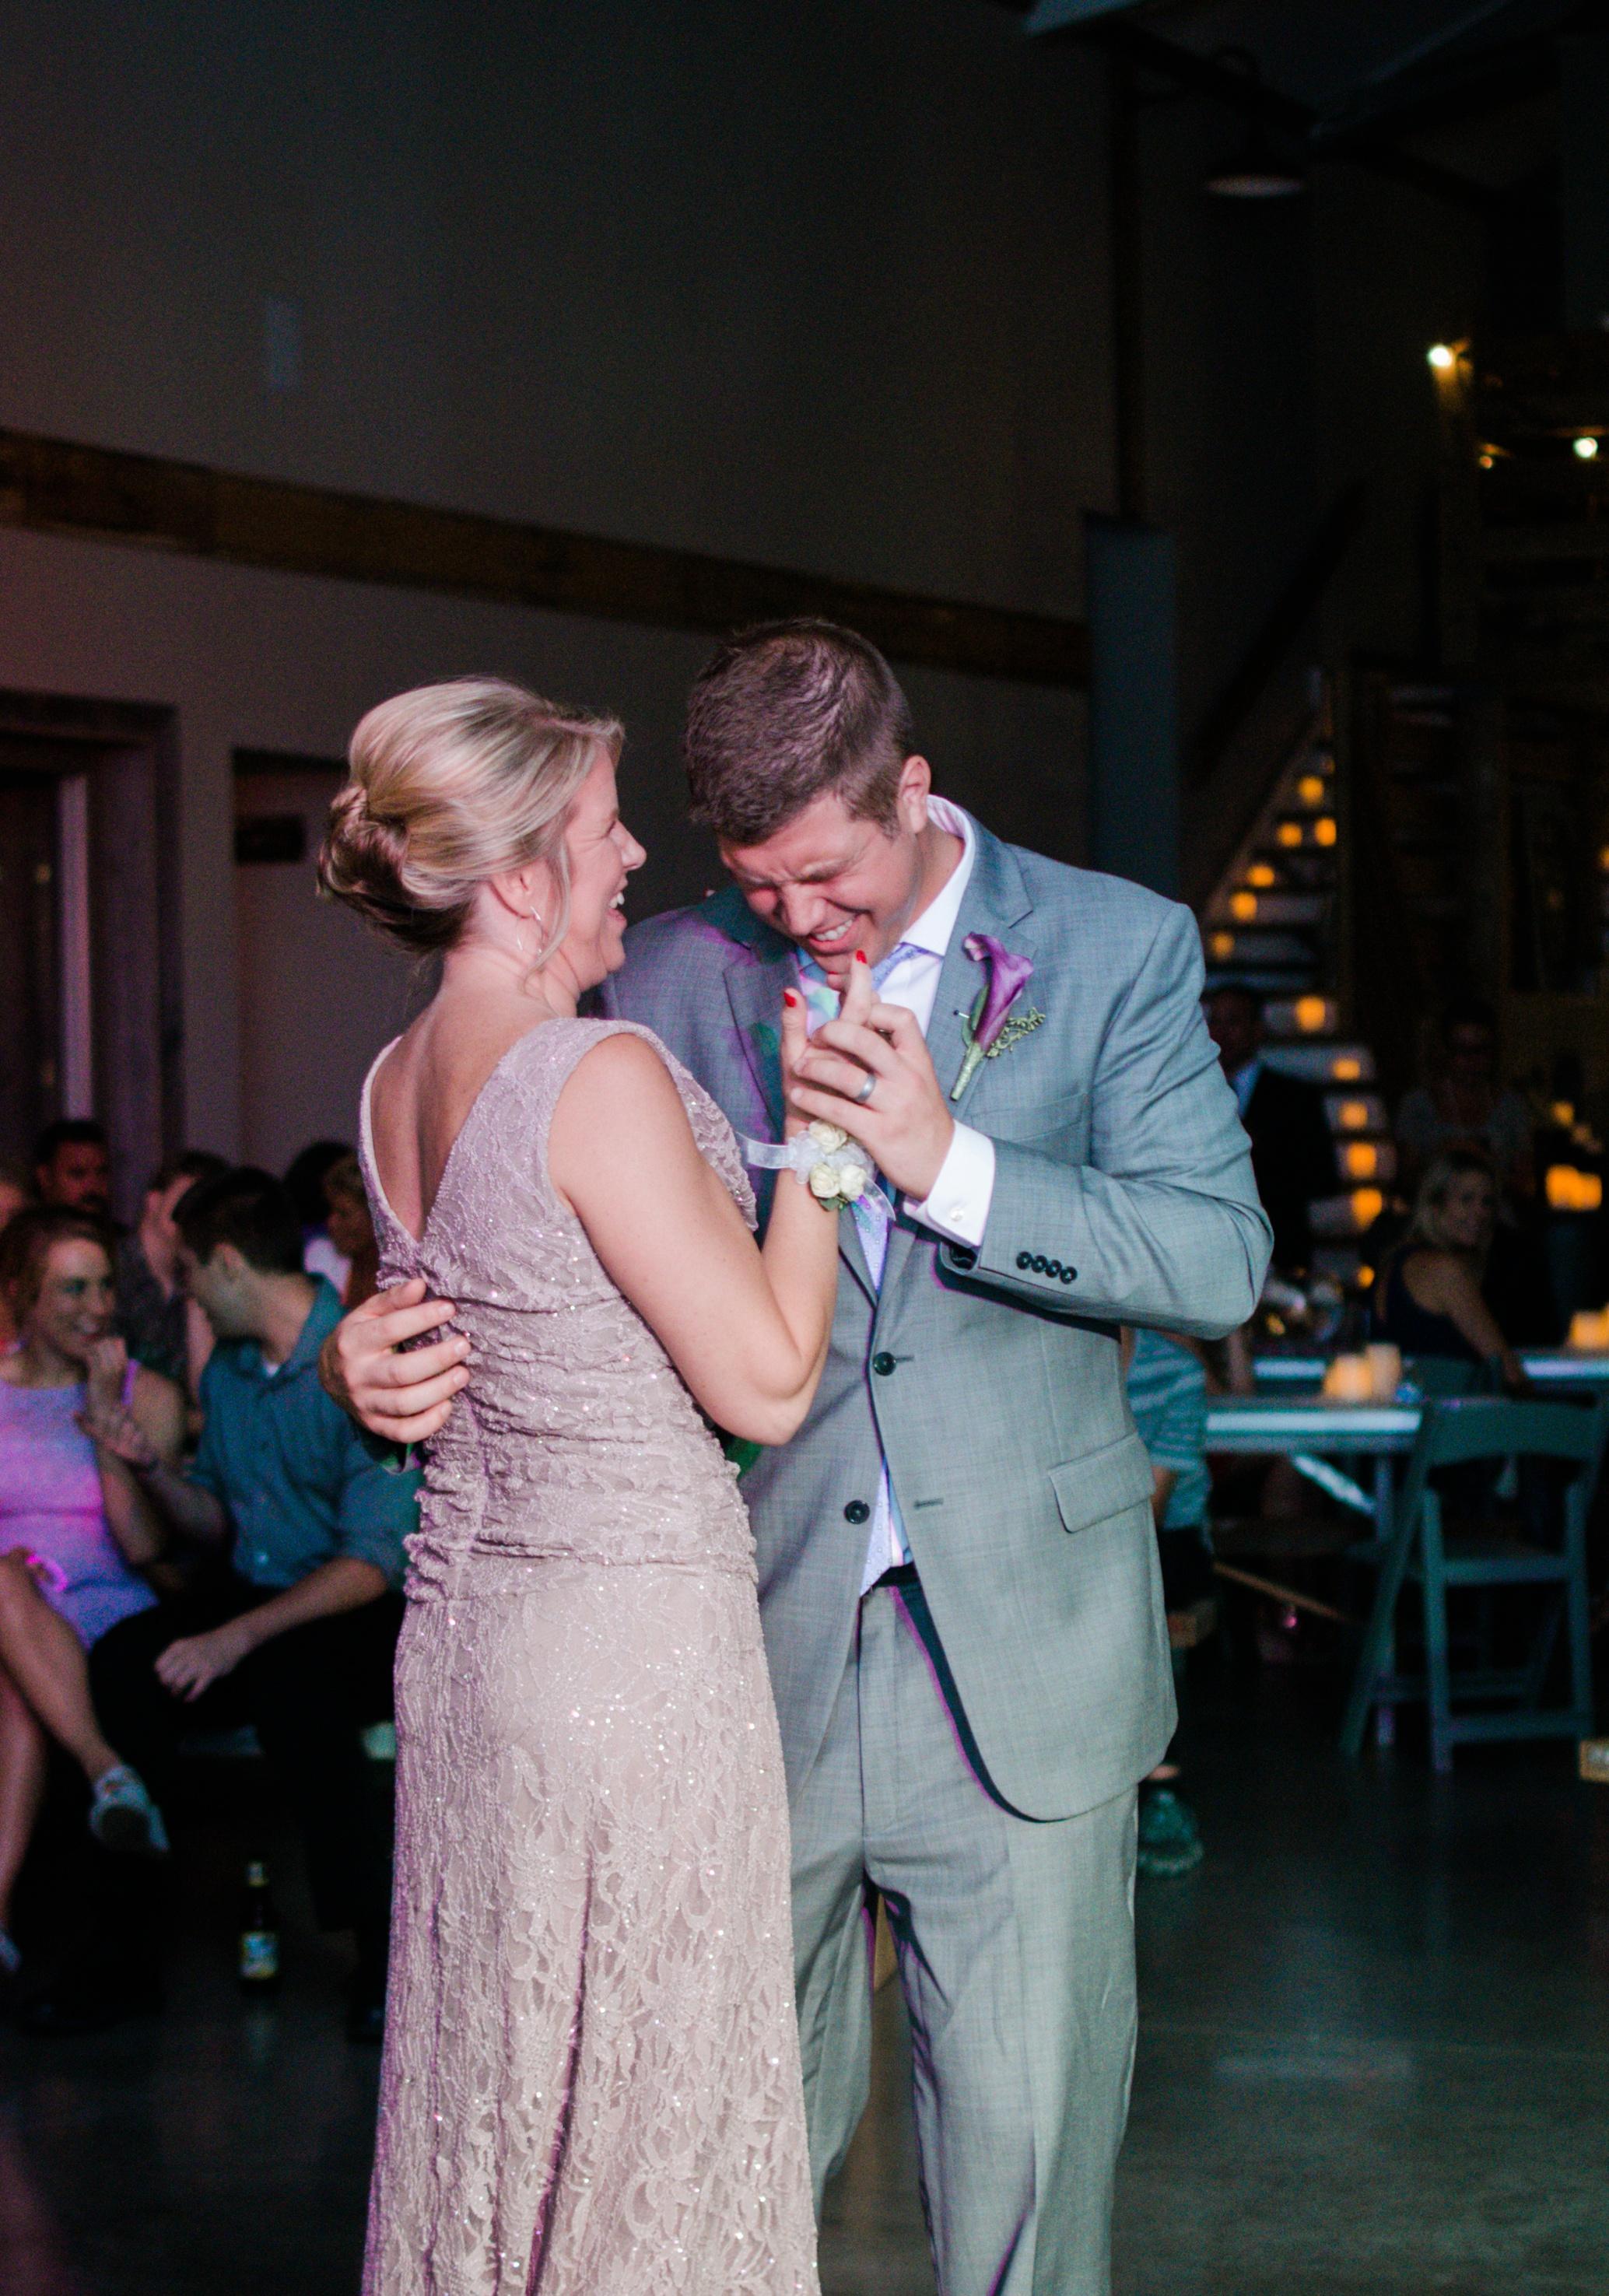 Barnes' Place Rustic Outdoor Wedding | Ali Leigh Photo Minneapolis Wedding Photographer_0177.jpg